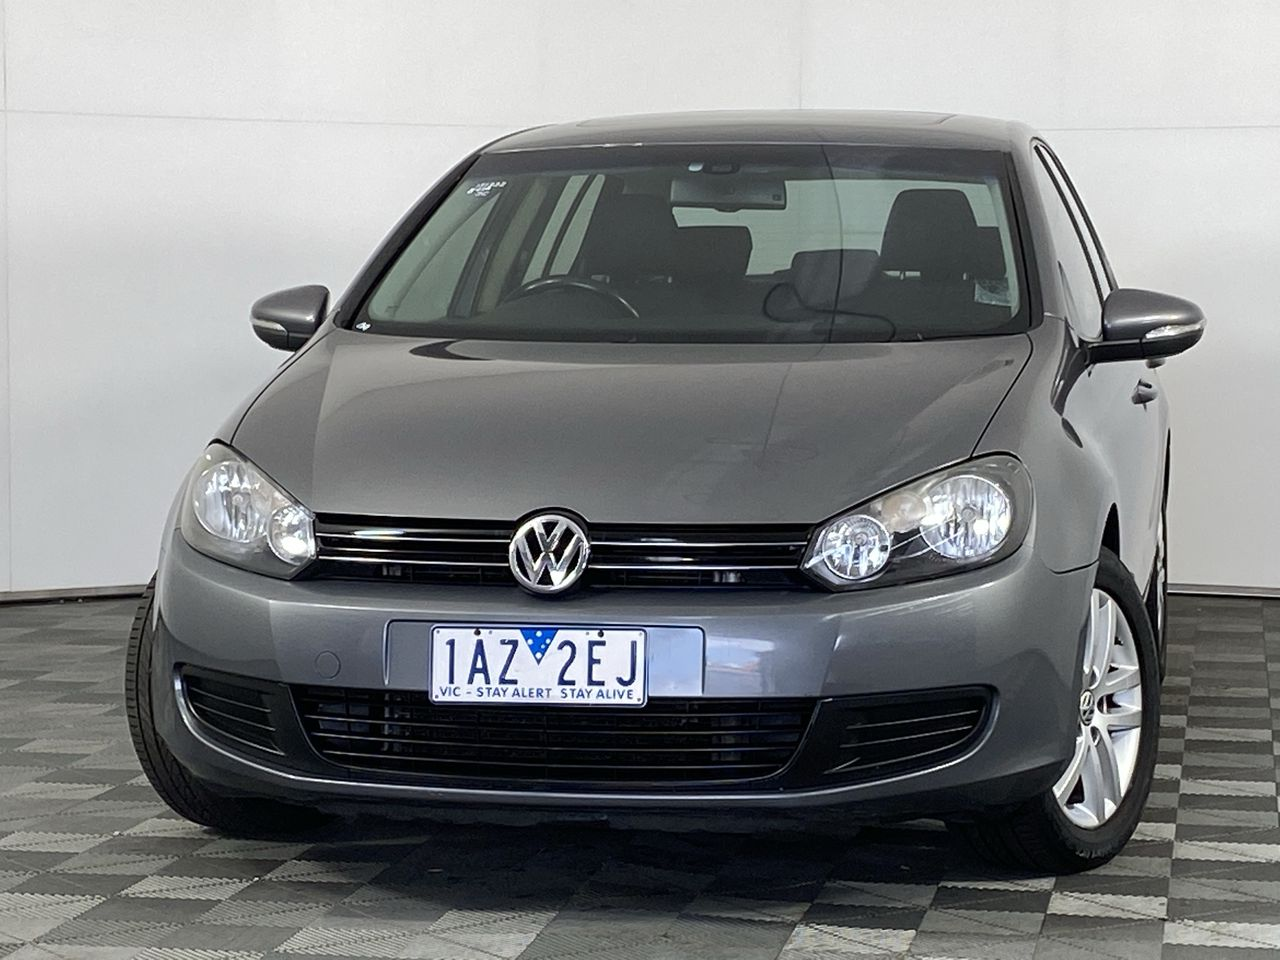 2010 Volkswagen Golf 103 TDI COMFORTLINE A6 Turbo Diesel Manual Hatchback